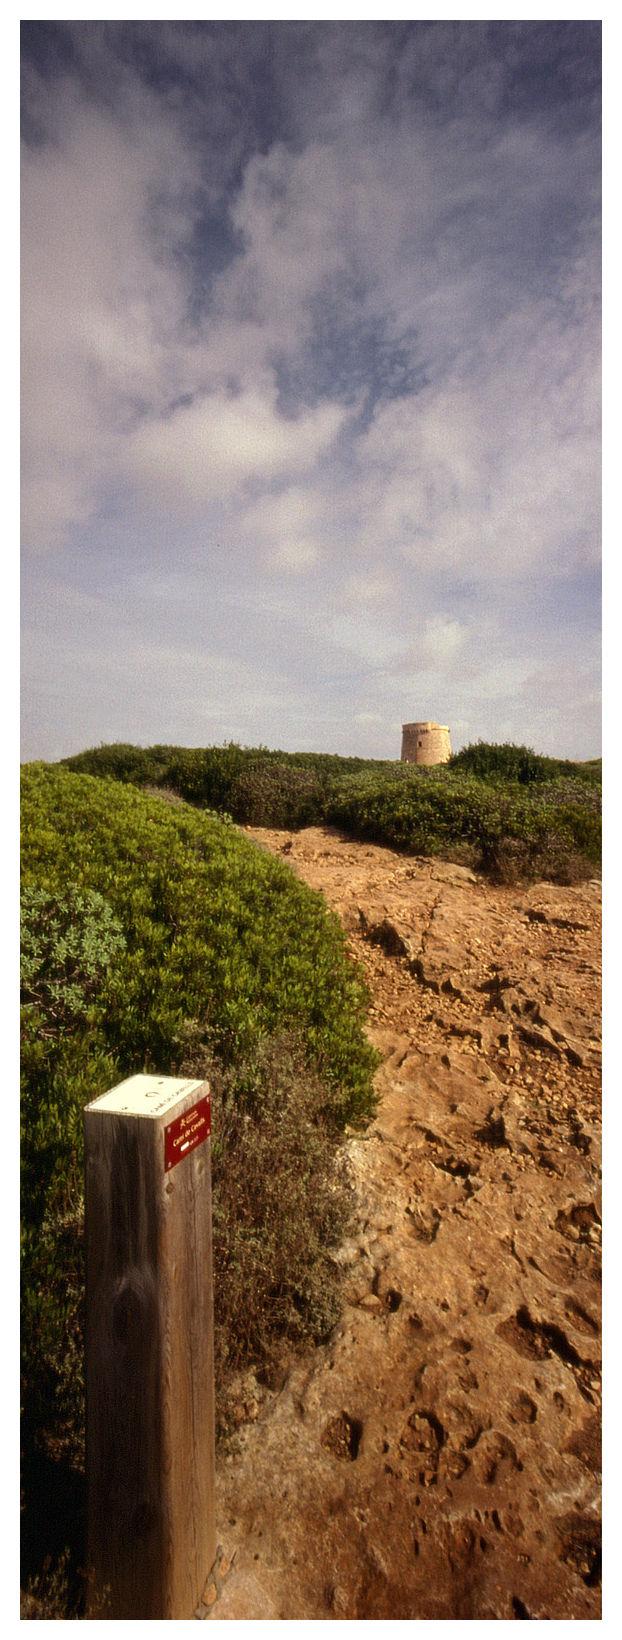 Menorca. October 2010